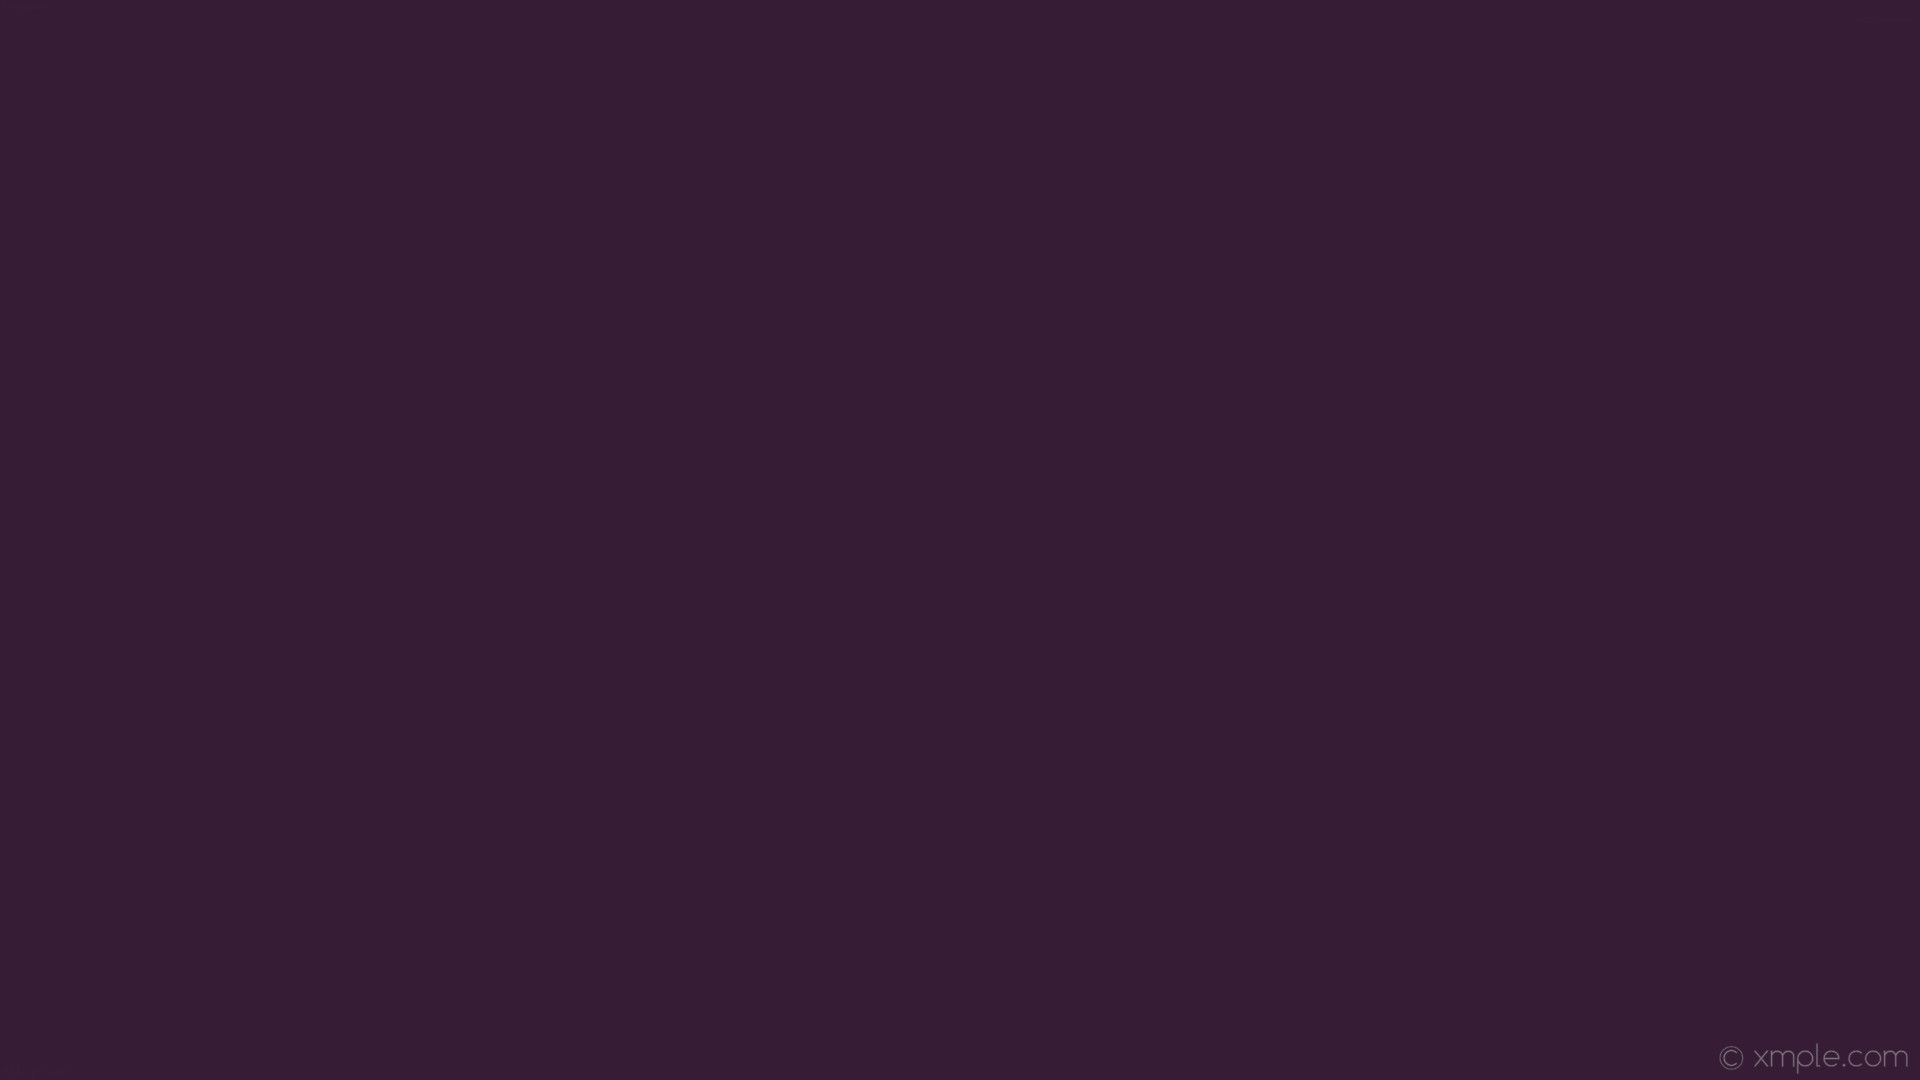 wallpaper solid color one colour plain magenta single dark magenta #361c34